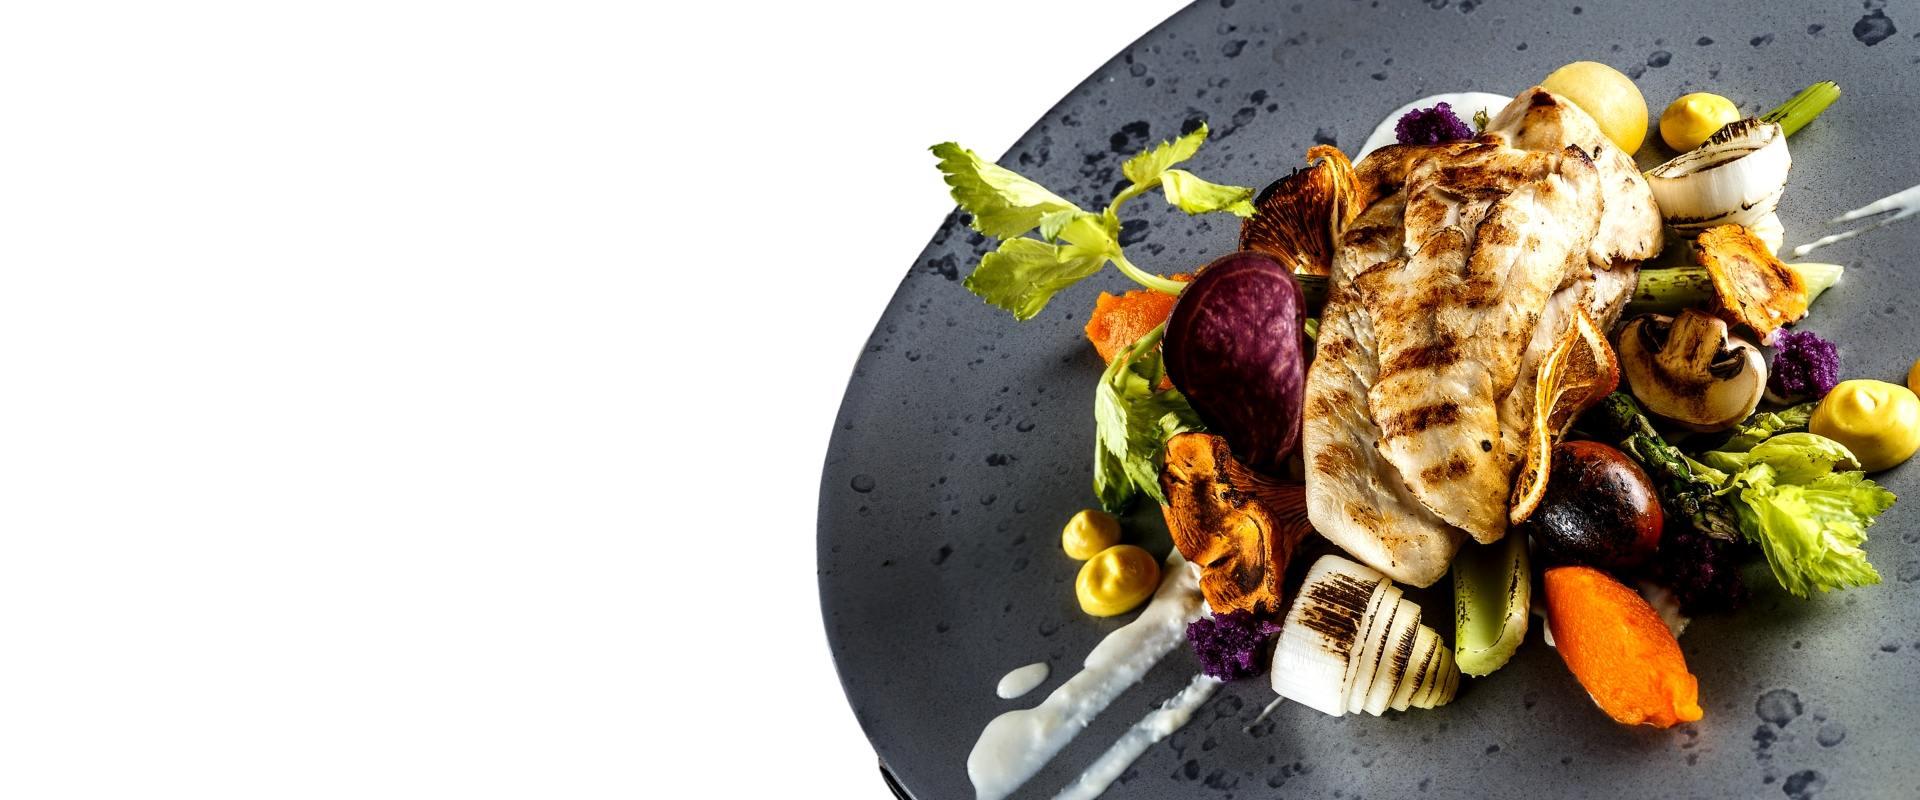 <small><small> Кулинарный курс </small></small><br> ресторанные блюда дома за 30 минут